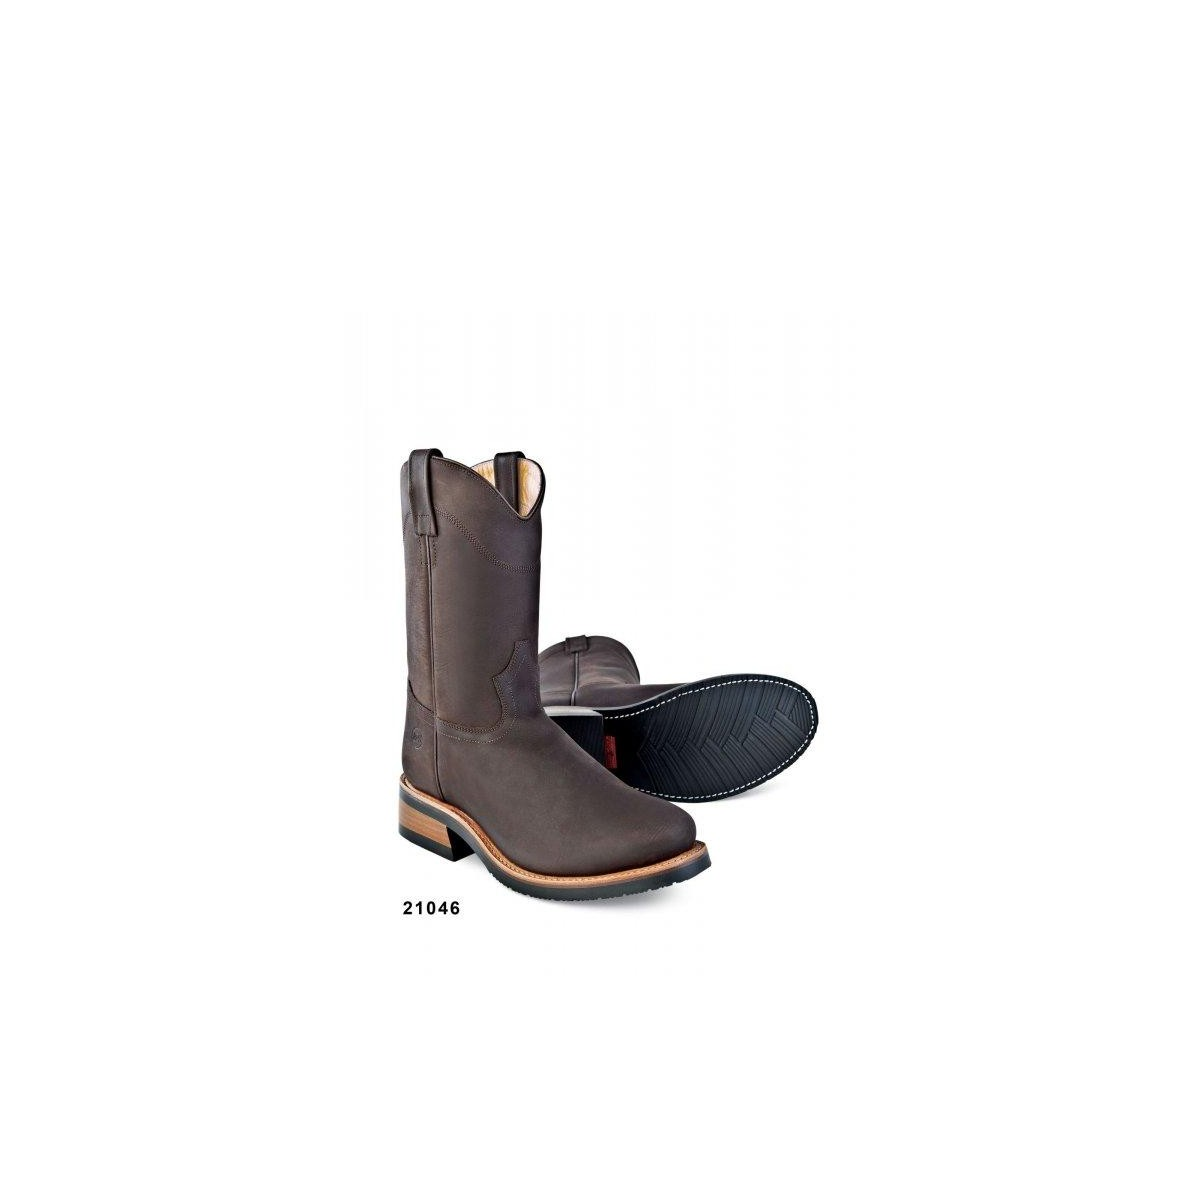 scarpe sportive c7f05 9fed9 STIVALI ADULT CLASSIC OLD WEST